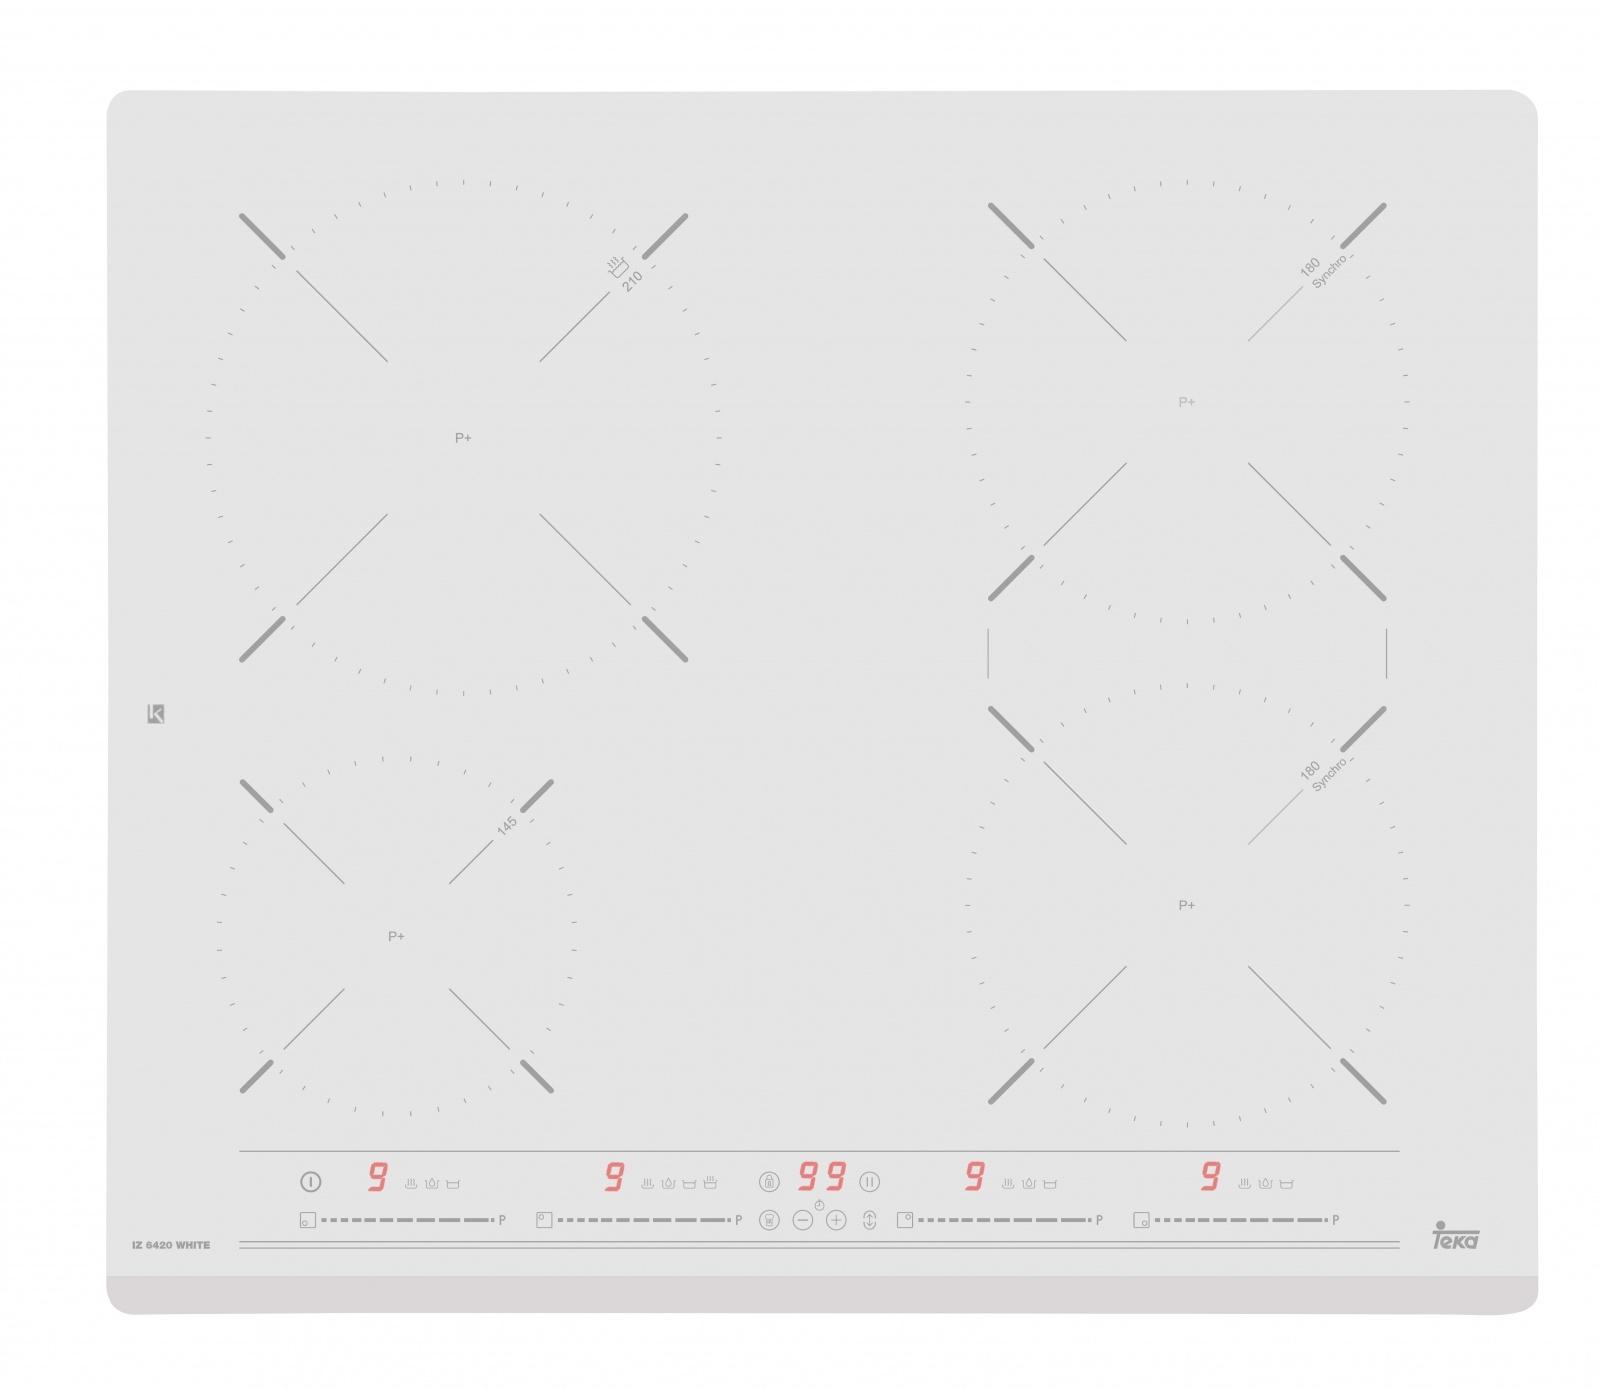 Plita inductie incorporabila Teka IZ 6420 cu 4 zone 60cm alb